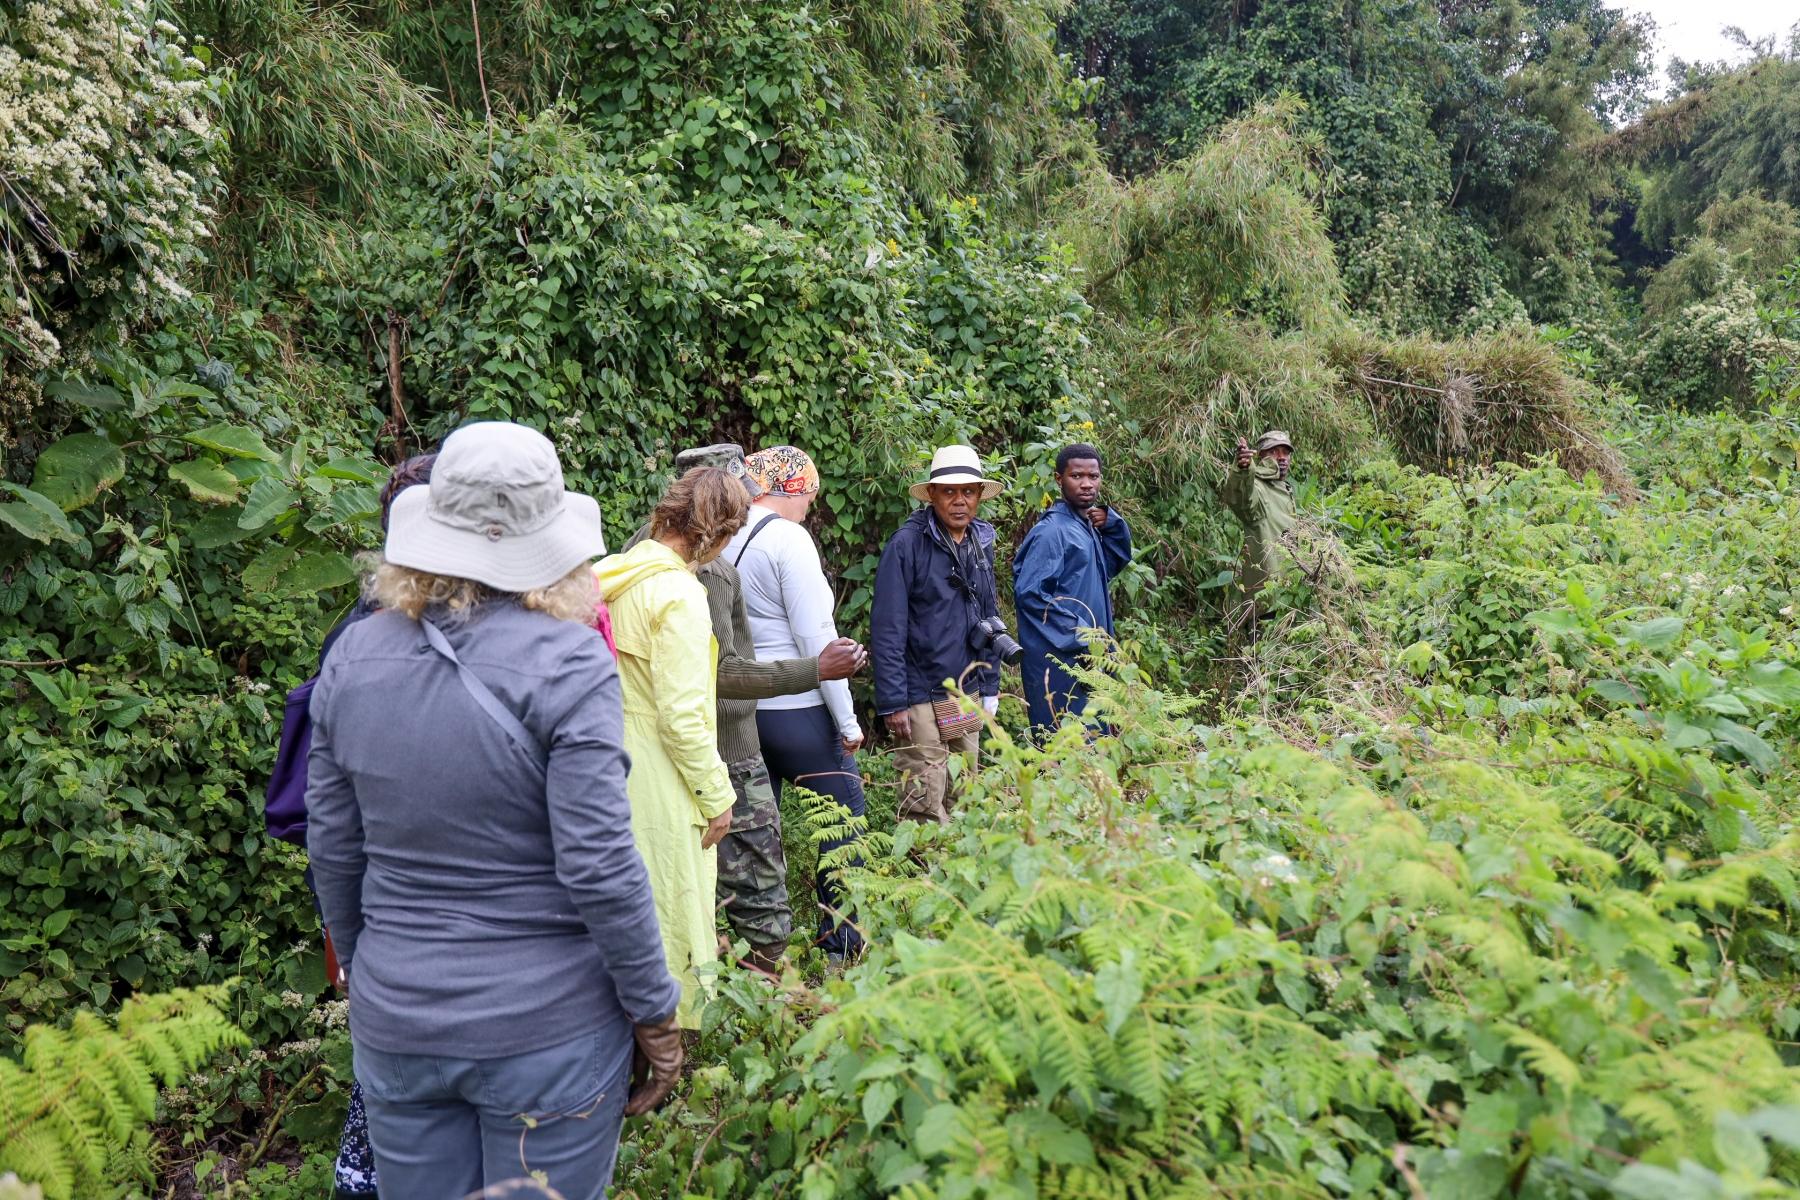 Rwanda-Gorilla-Trekking-Photo-Credit-Kate-Webster-159